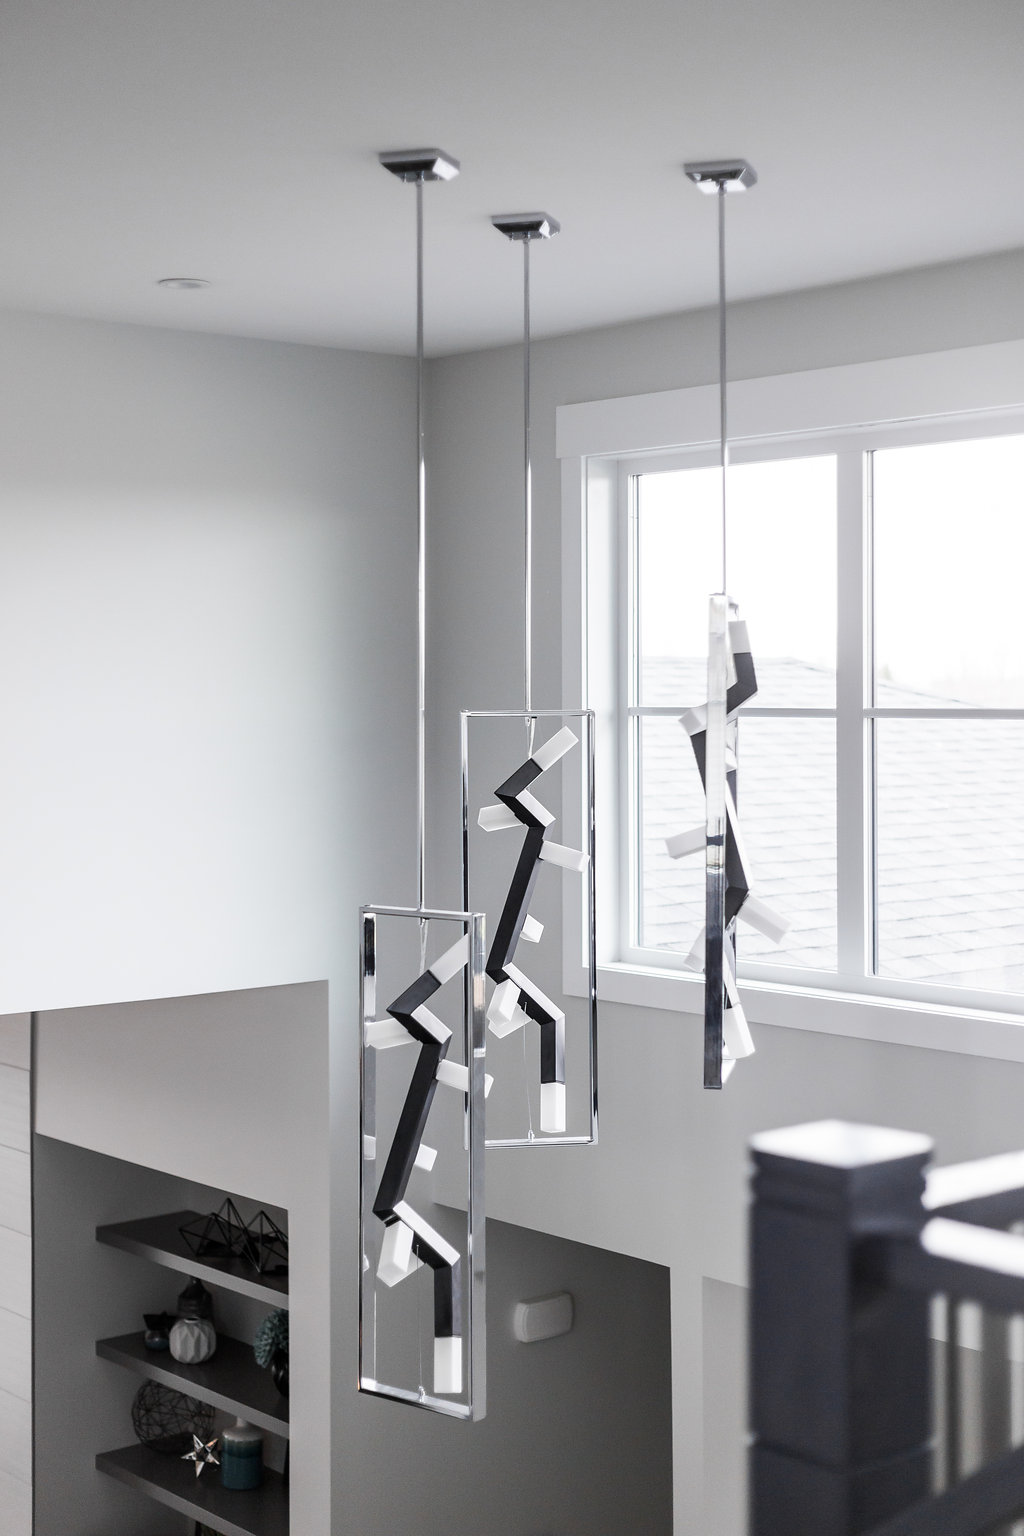 Calgary Modern Interior Design Light Fixture 1.jpg